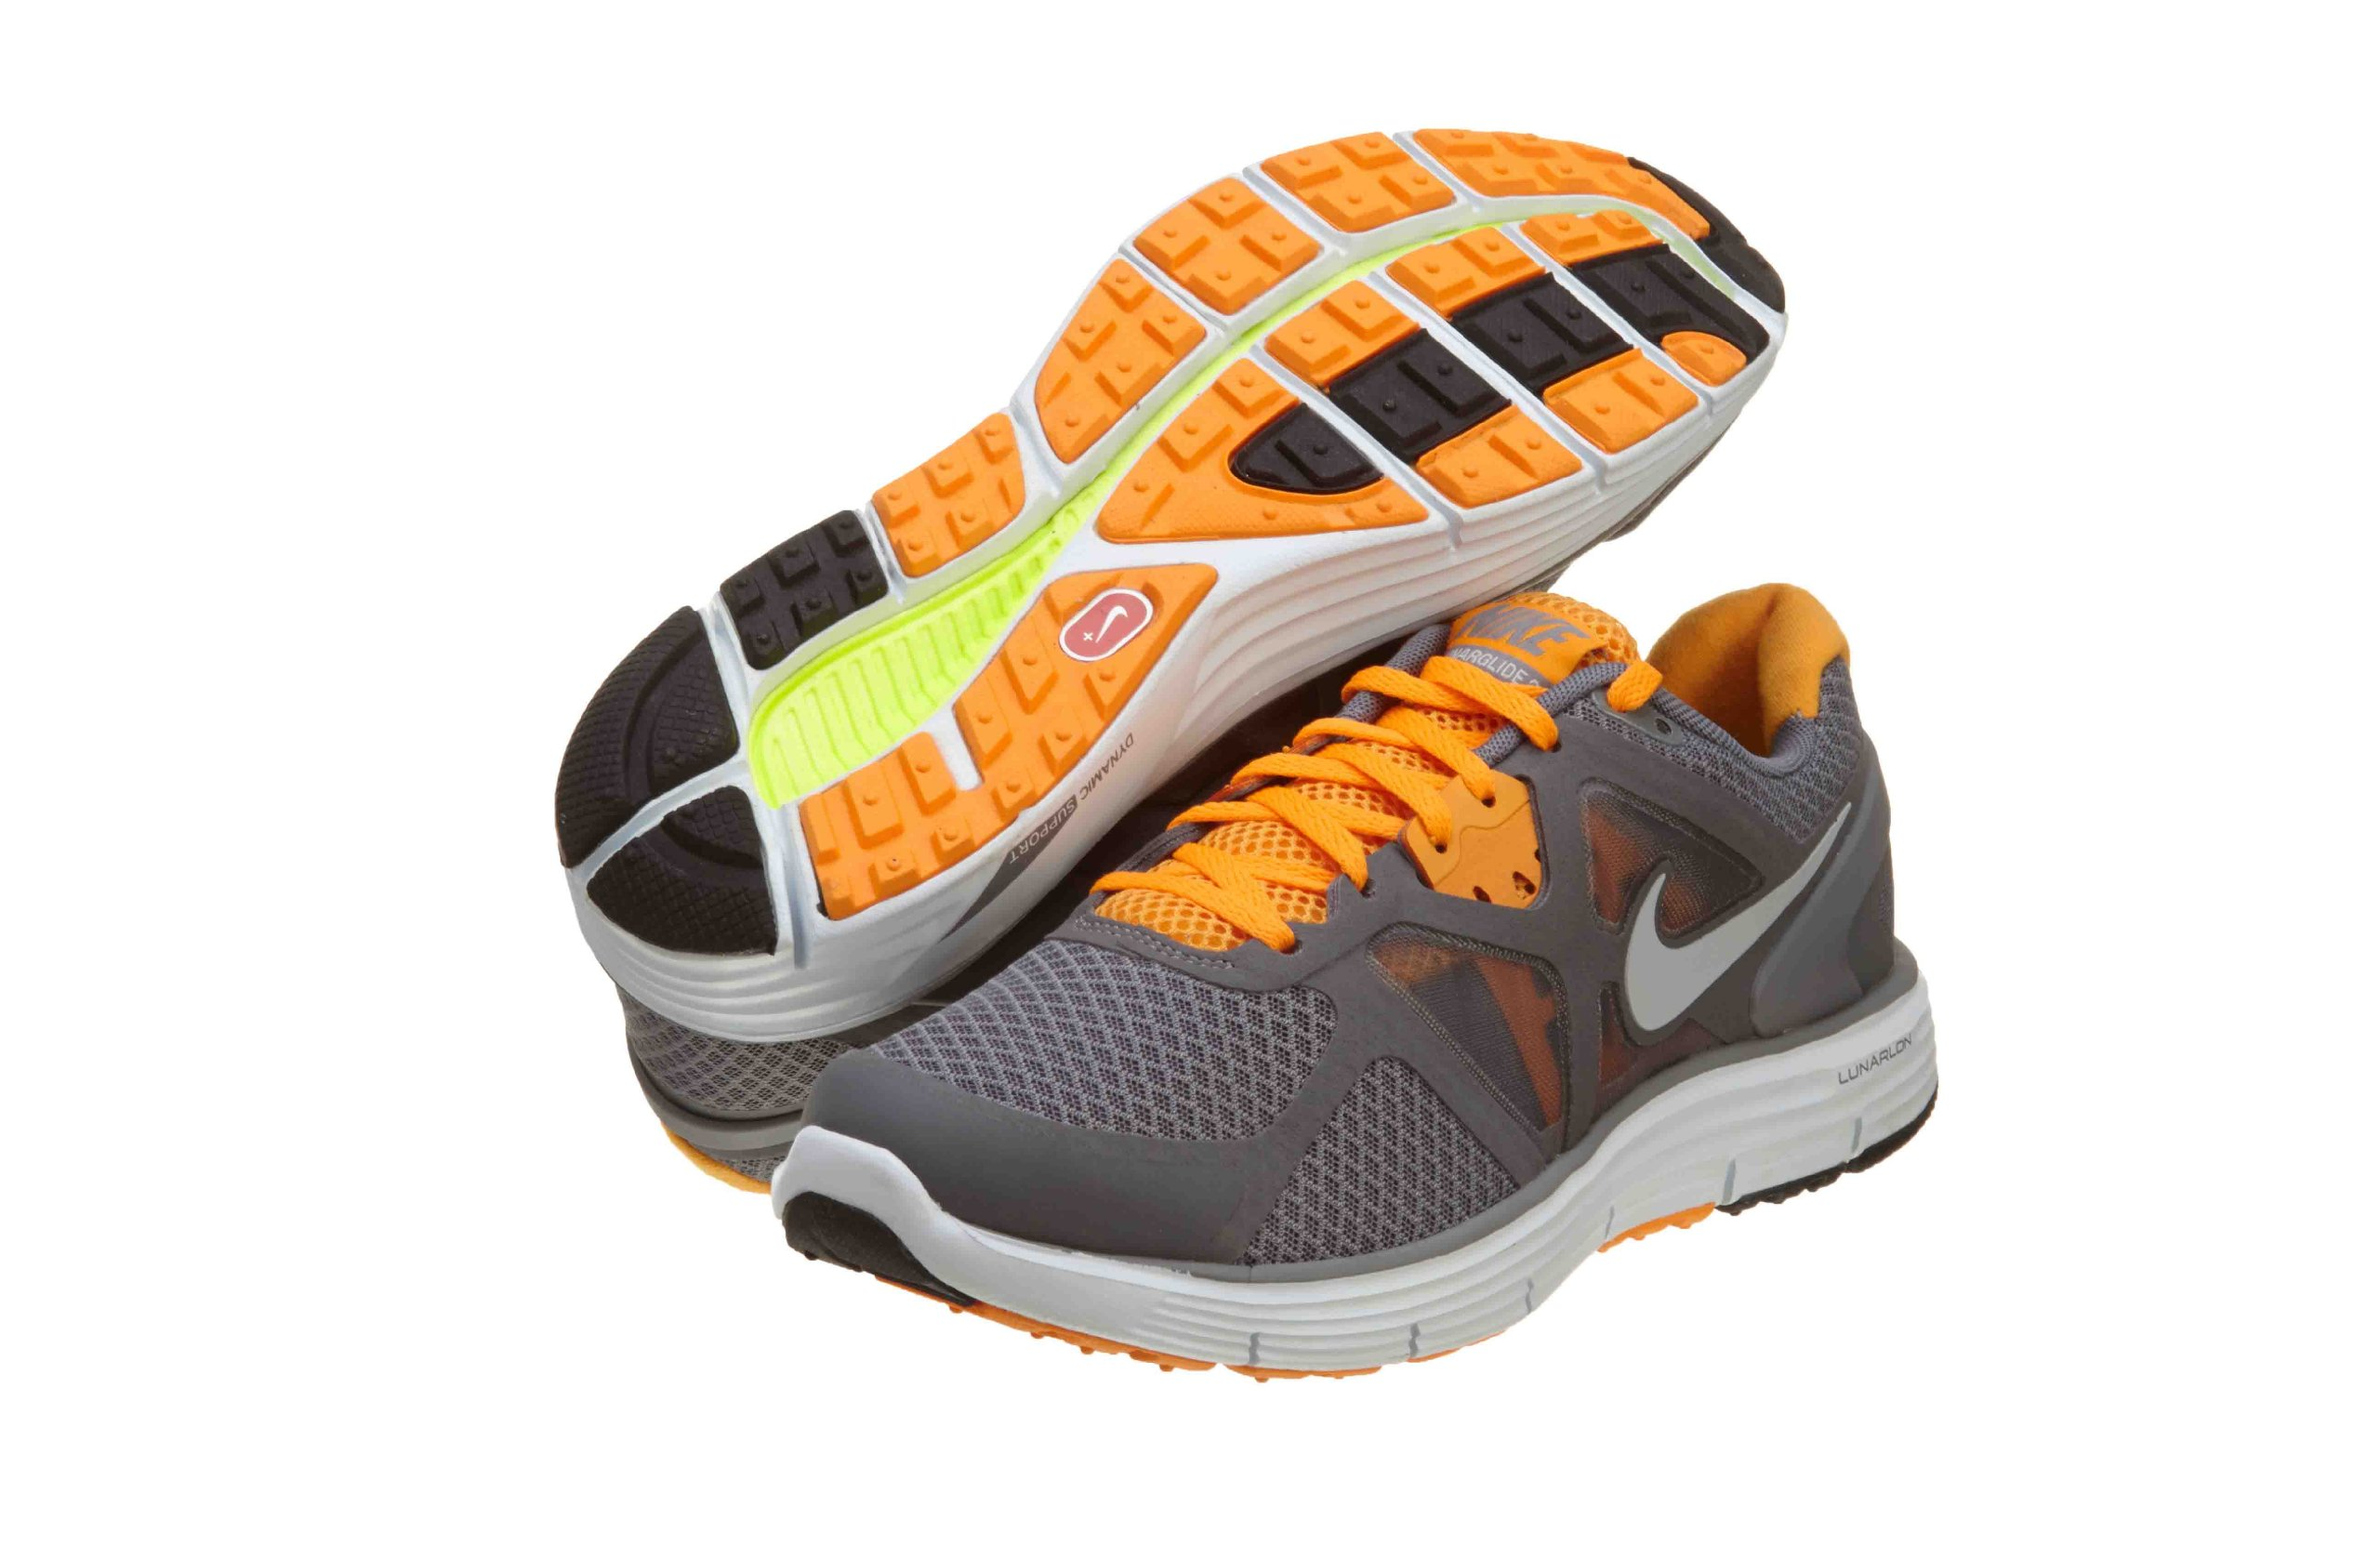 Nike Lunarglide+ 3 Women454315 Style: 454315-008 Size: 9.5 M US